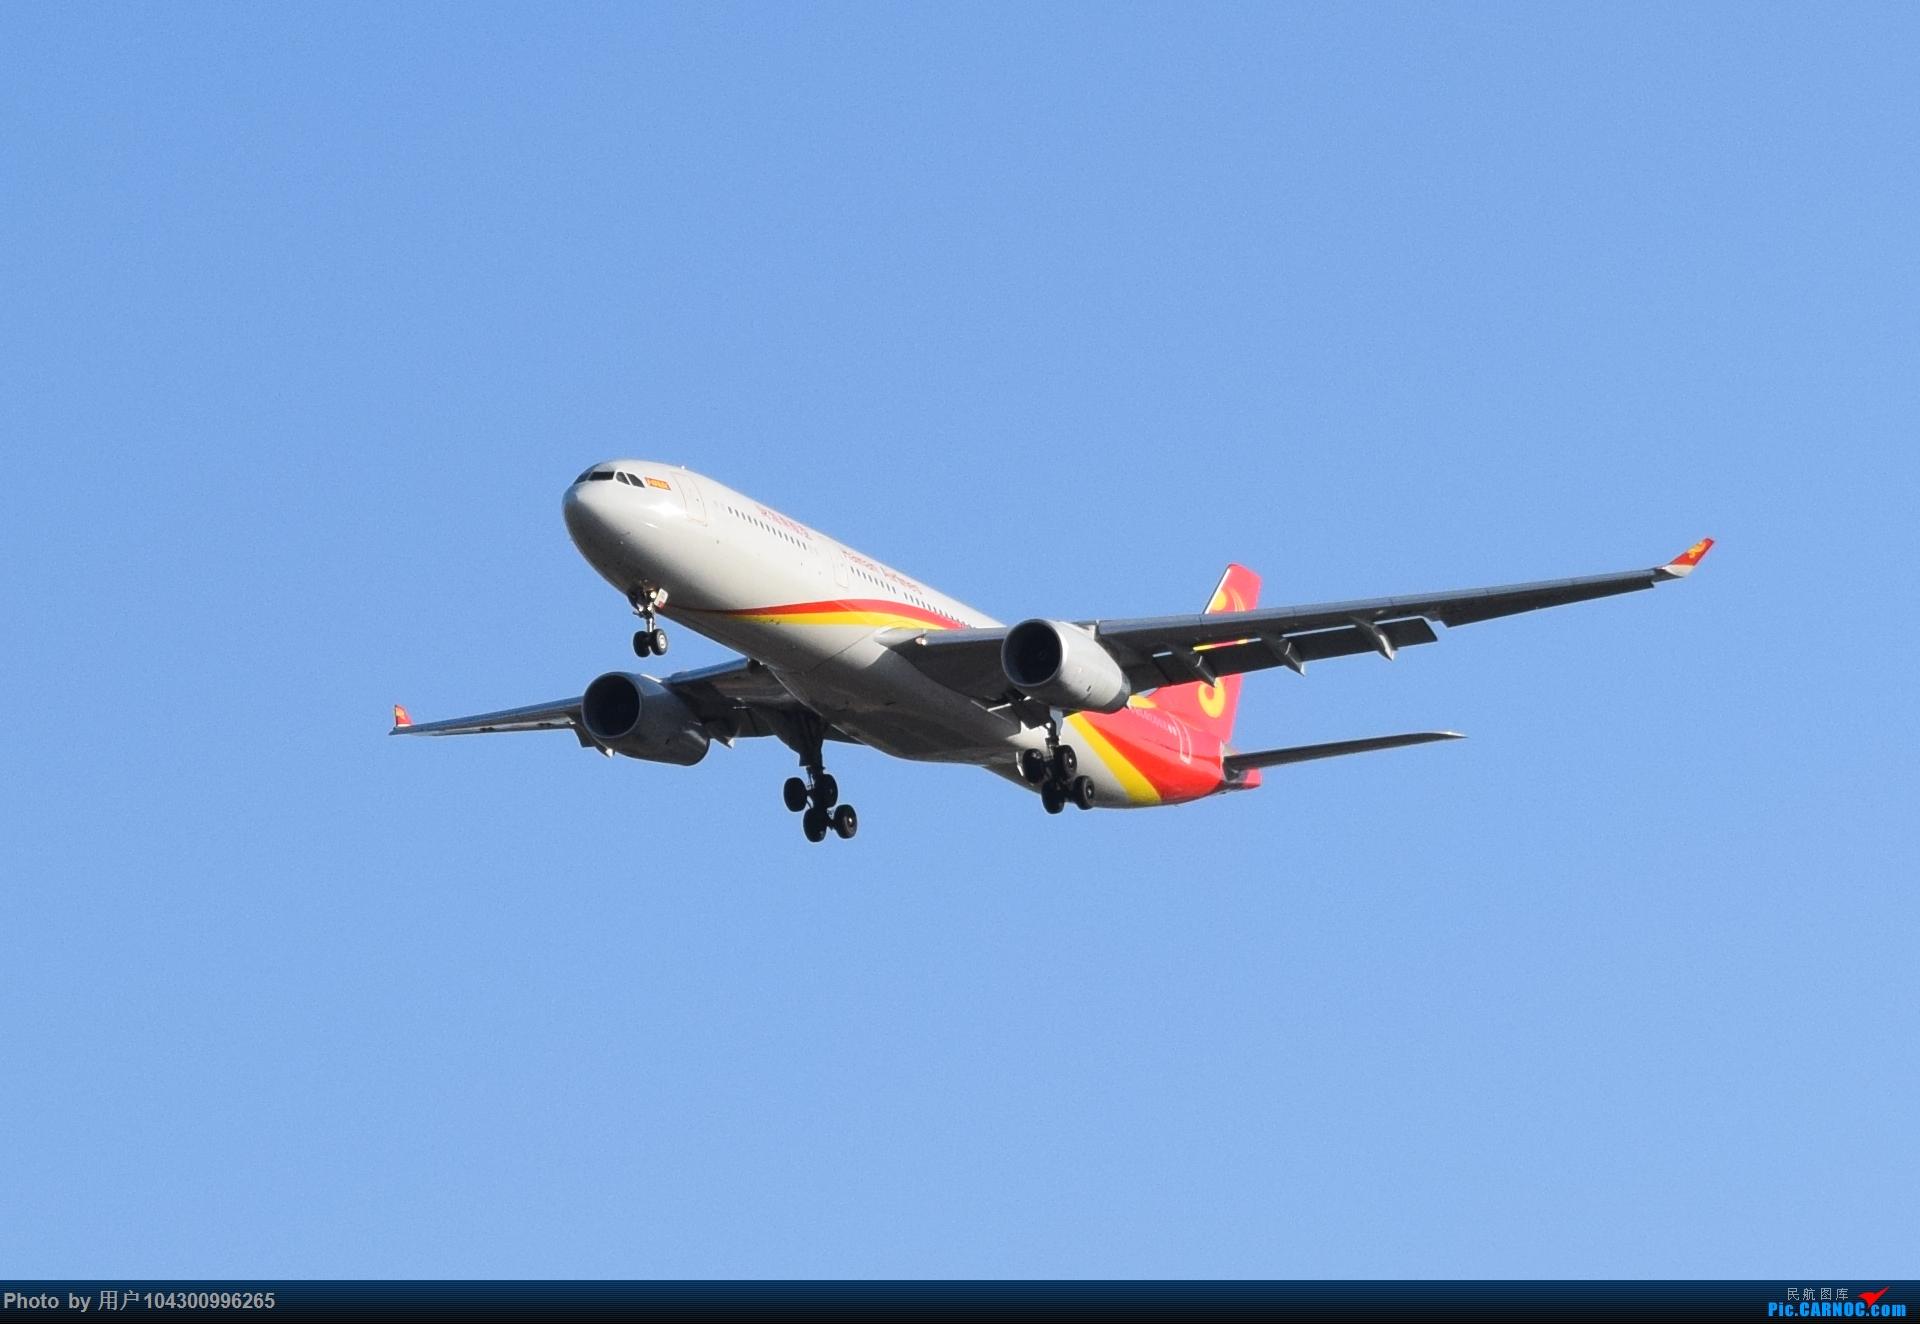 Re:[原创][KWE]贵阳今天天气不错,随便拍几张! AIRBUS A330-300 B-1097 中国贵阳龙洞堡国际机场